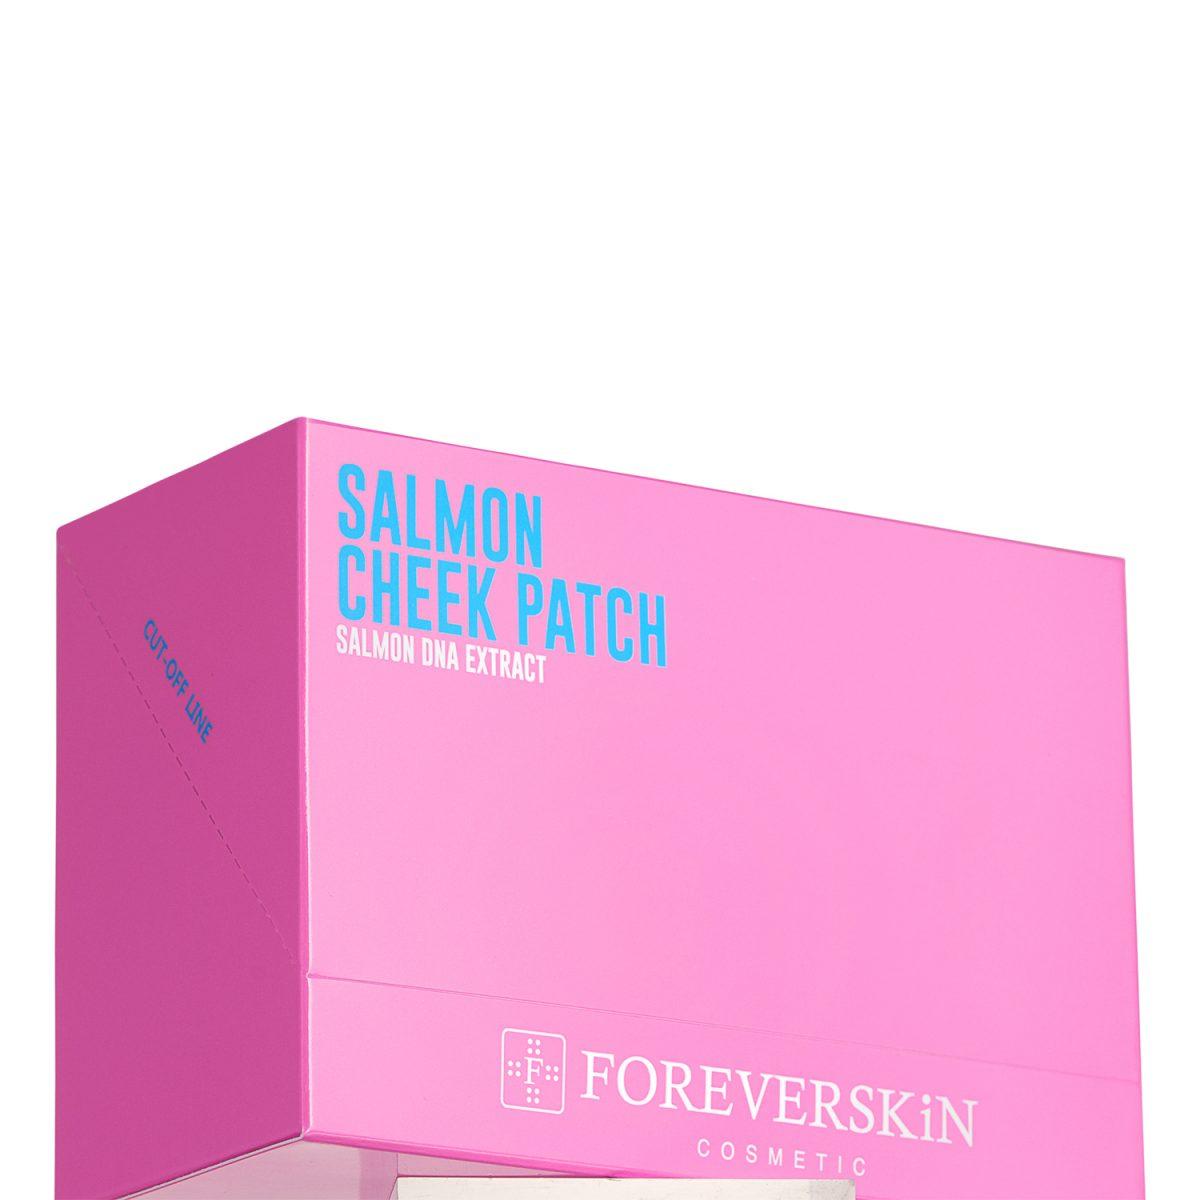 Патчи для щек Salmon cheek patch от Foreverskin 10шт